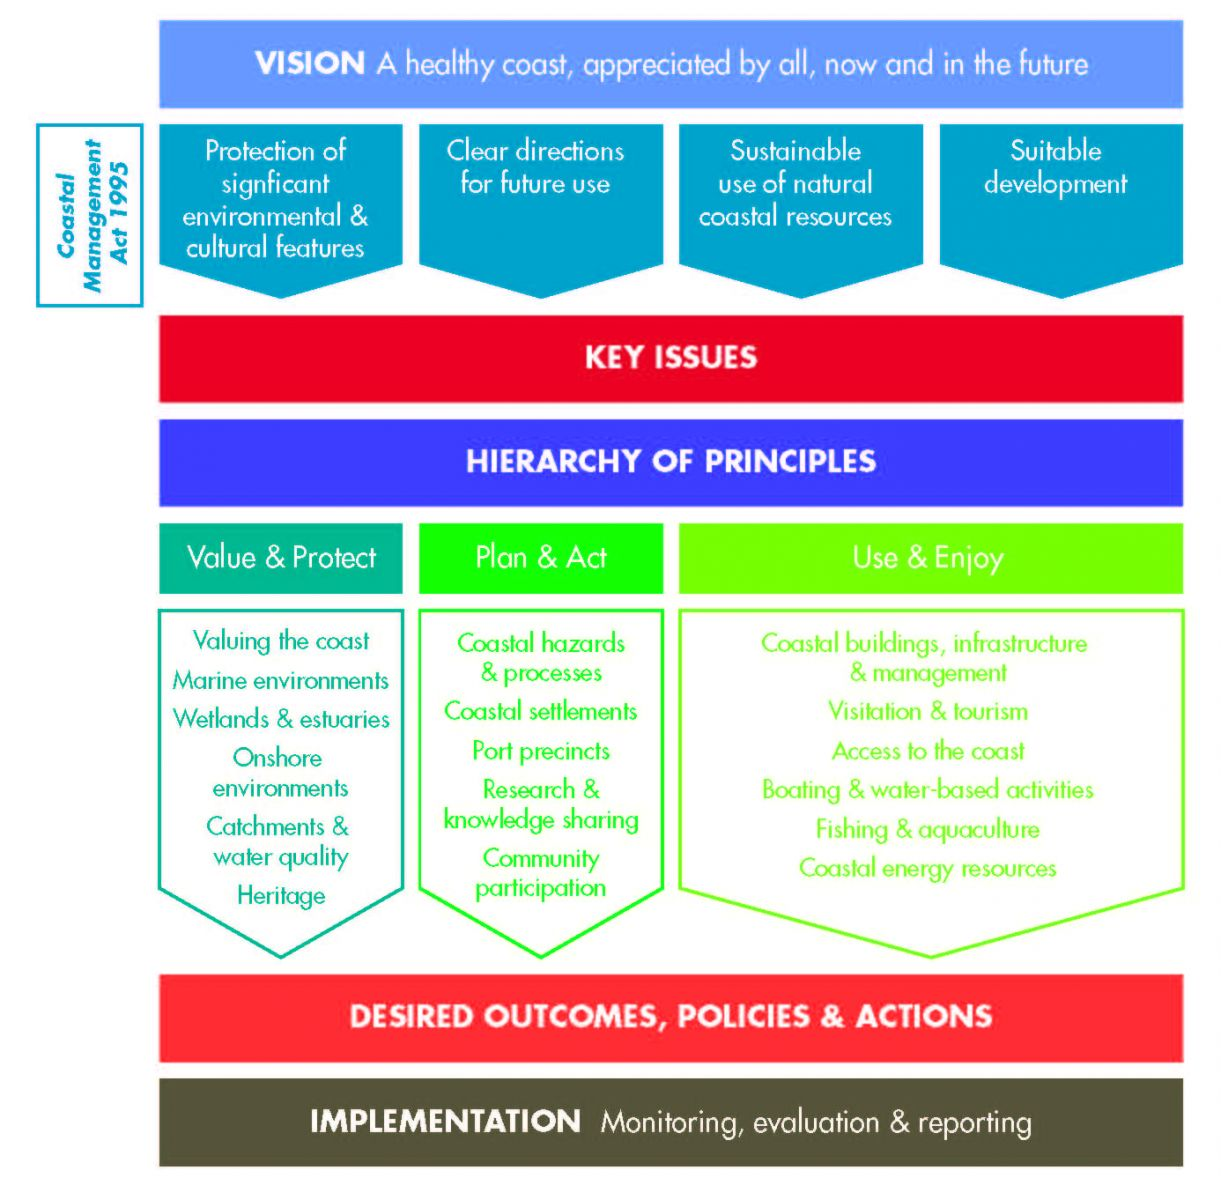 Victorian Coastal Strategy 2014 at a glance